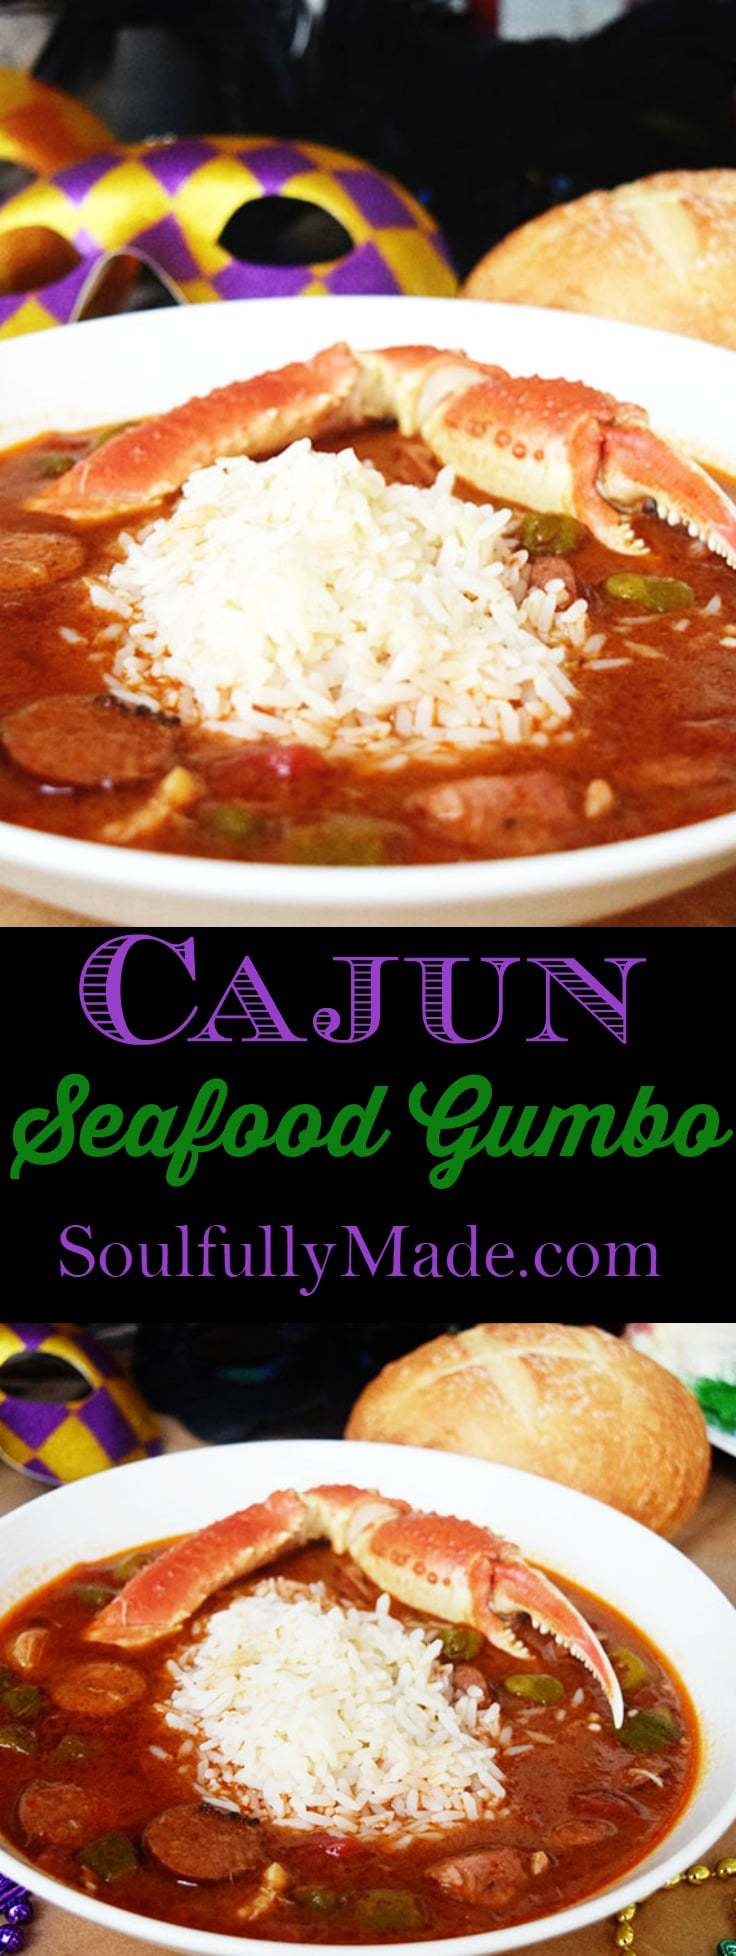 Cajun Seafood Gumbo